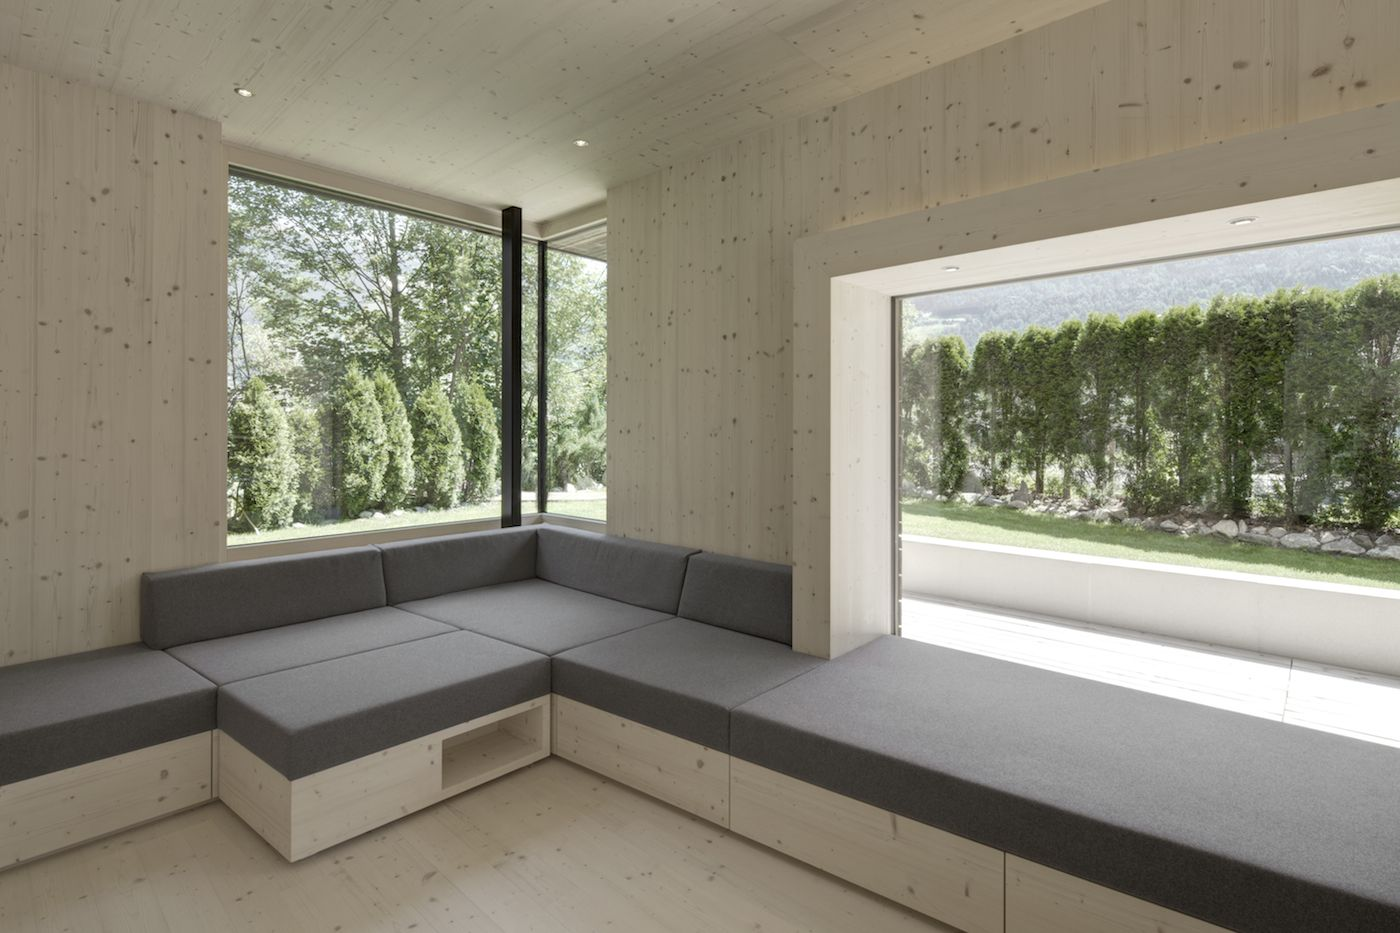 HAUS GASSER-RÖD / treyer trebo | Raumgestaltung | Pinterest | Haus ...